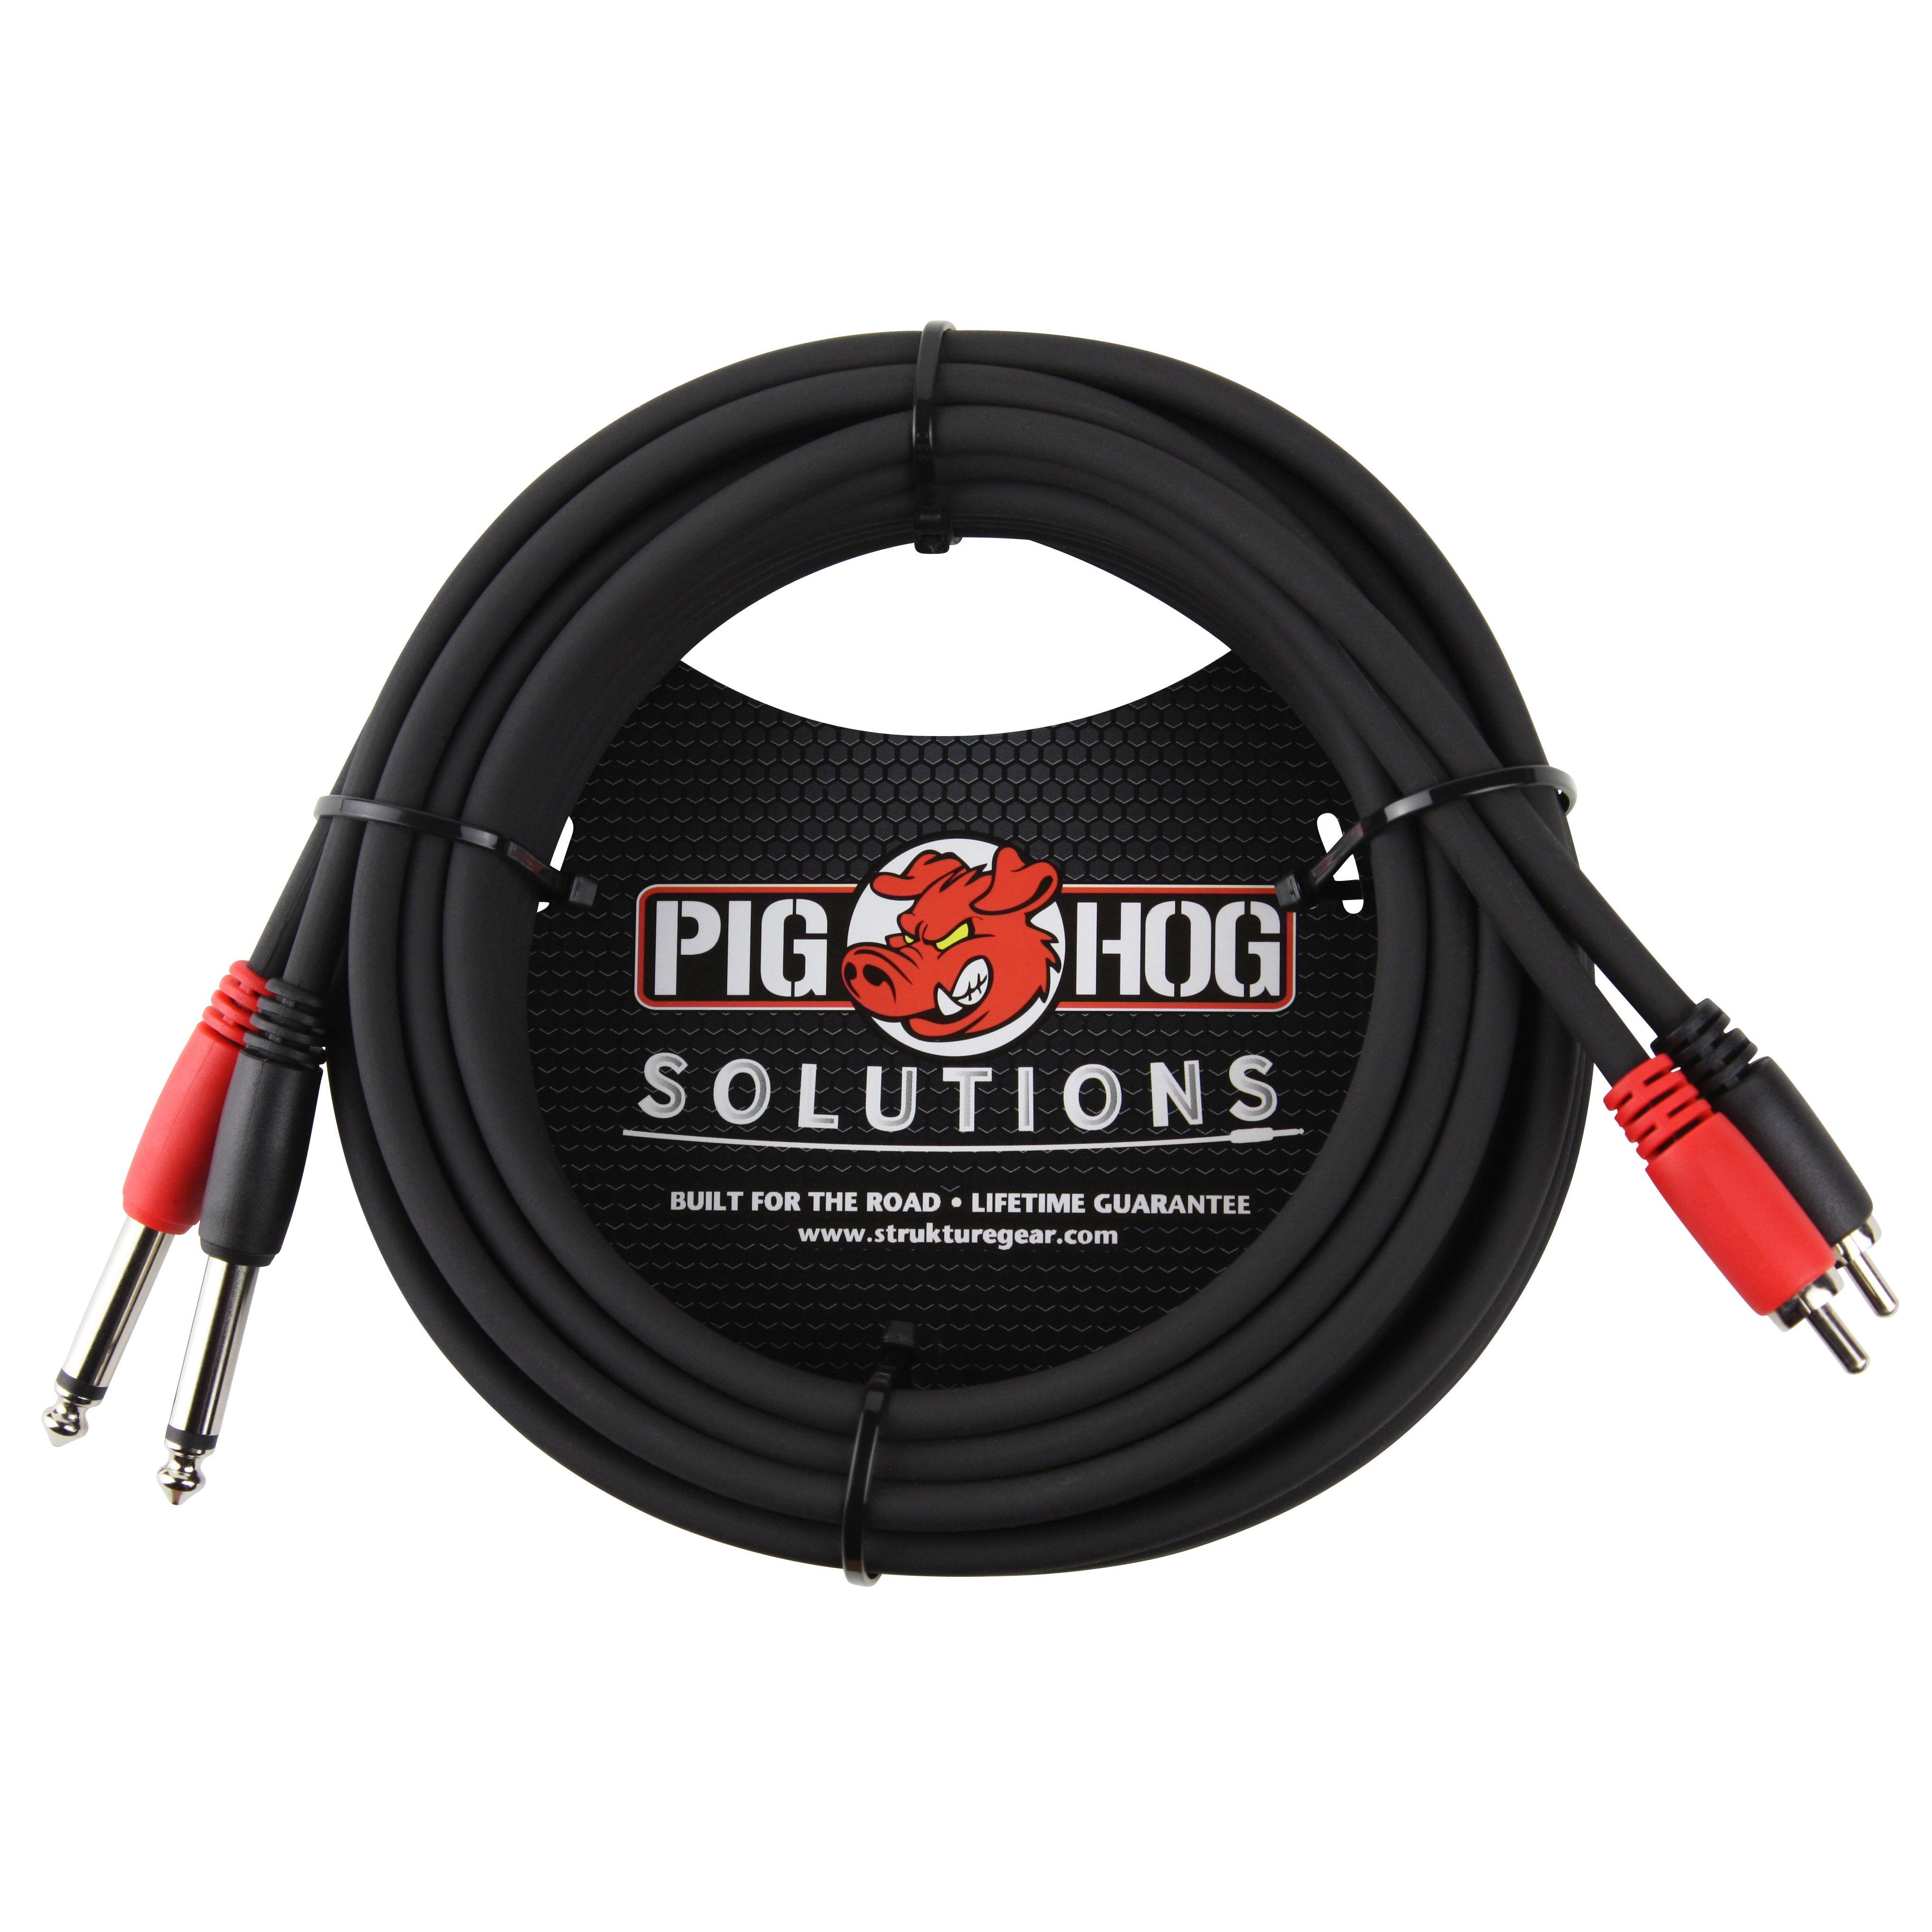 15 Feet Male Male Cable Pig Hog PD-R1415 Dual RCA to Dual 1//4 Mono